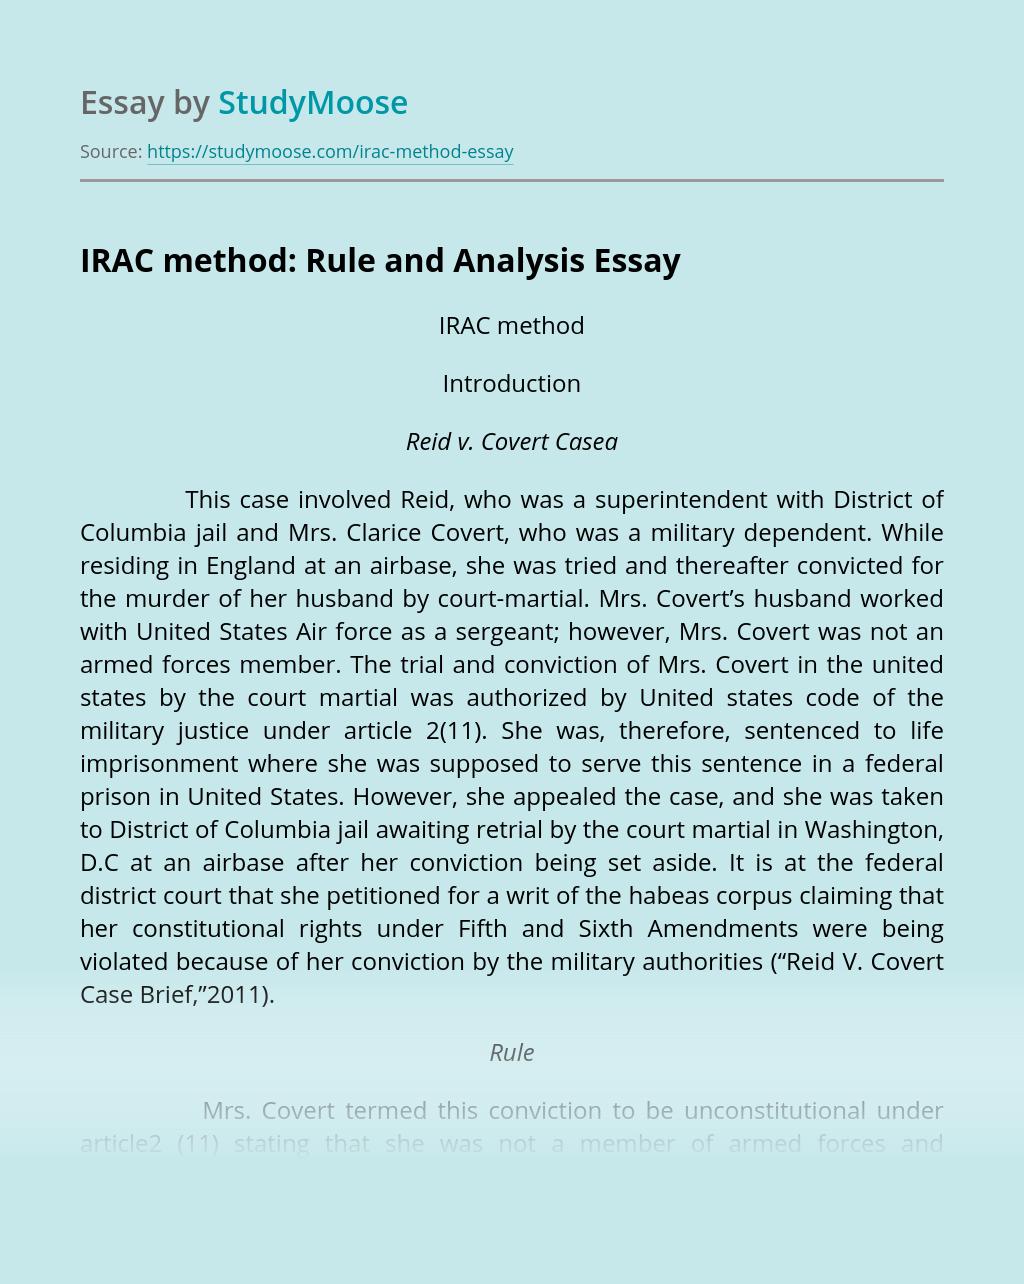 IRAC method: Rule and Analysis